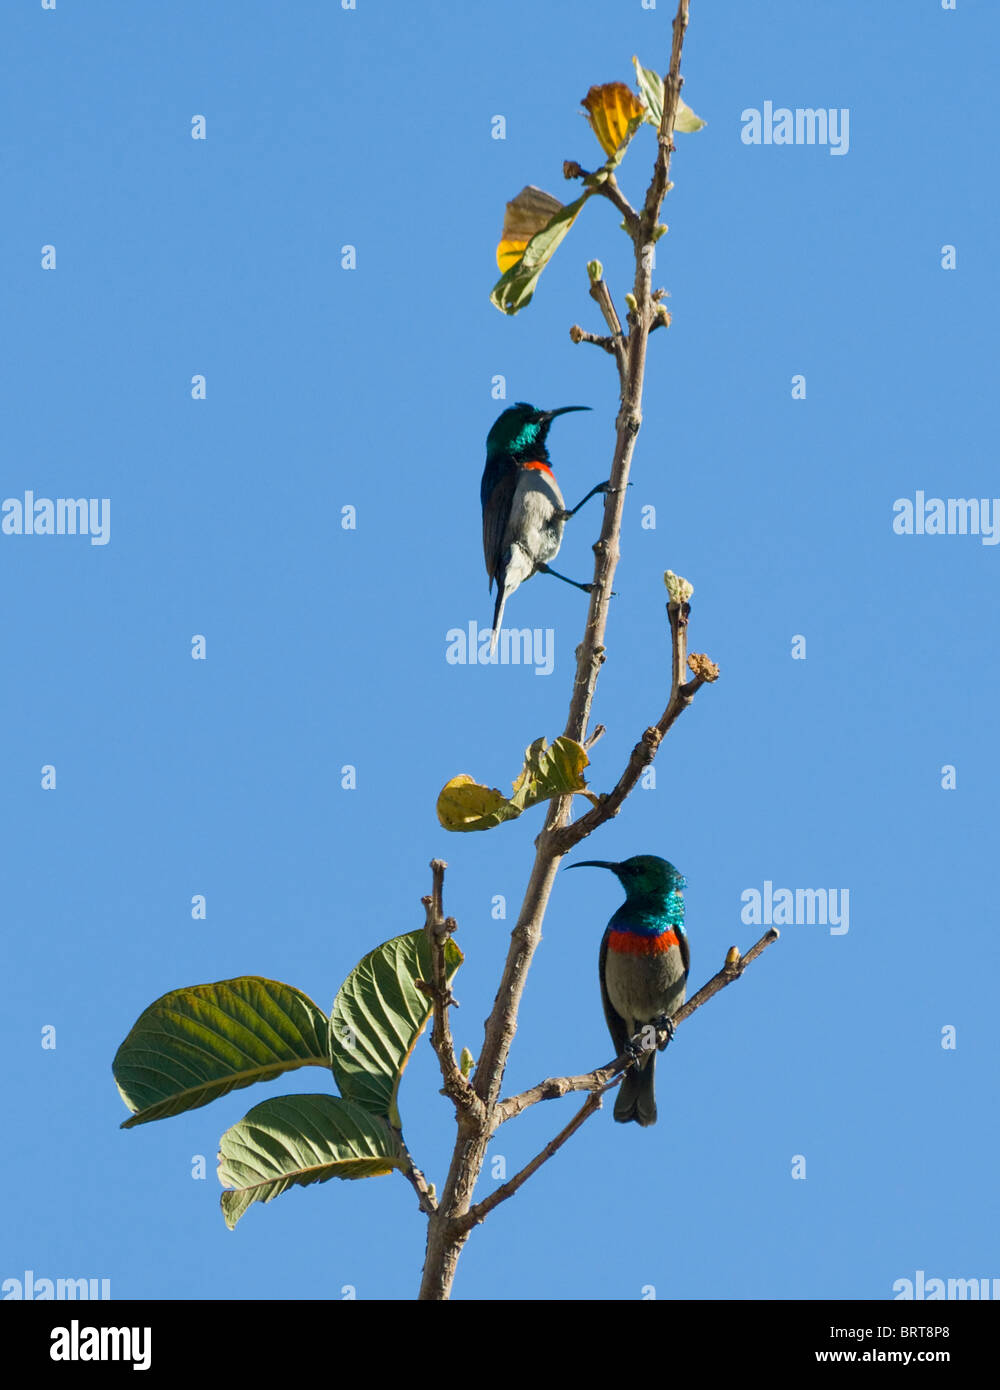 Southern Lesser Double-Collared Sunbirds Cinnyris chalybea - Stock Image